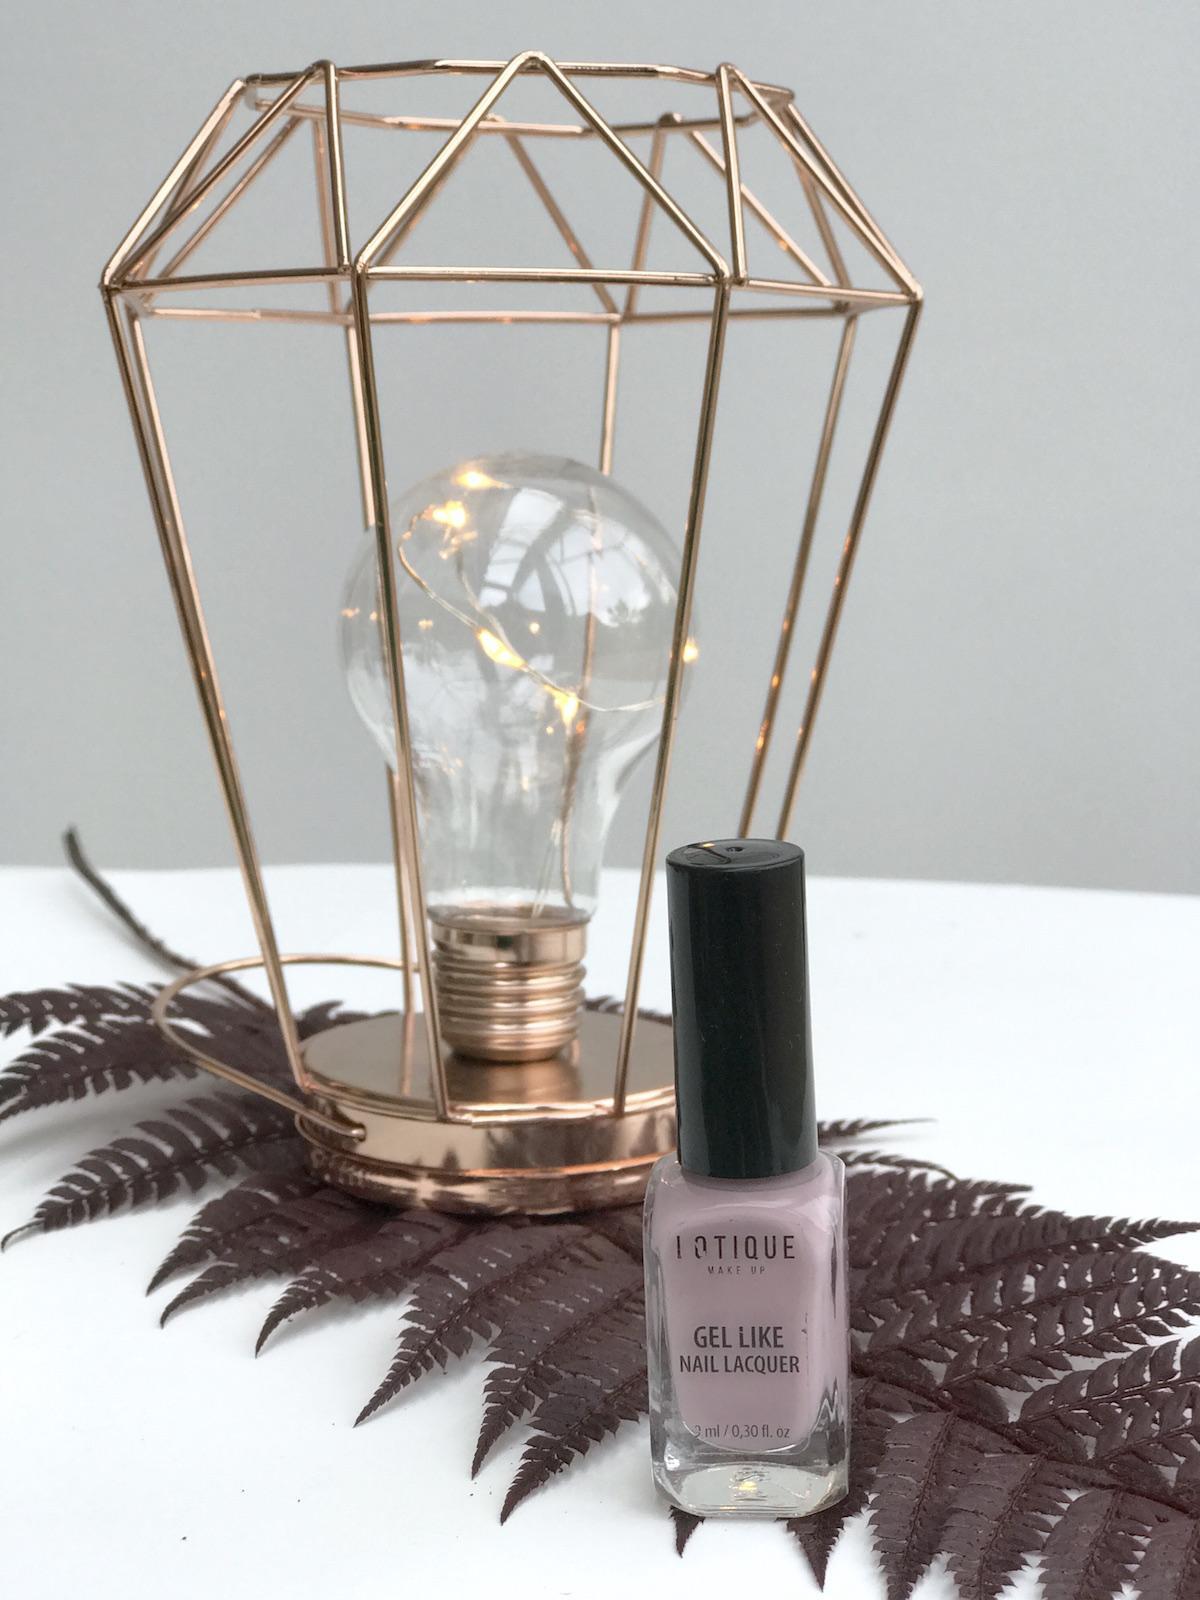 Lotique Makeup Beautyfullblog NIka Veger lak Gel like